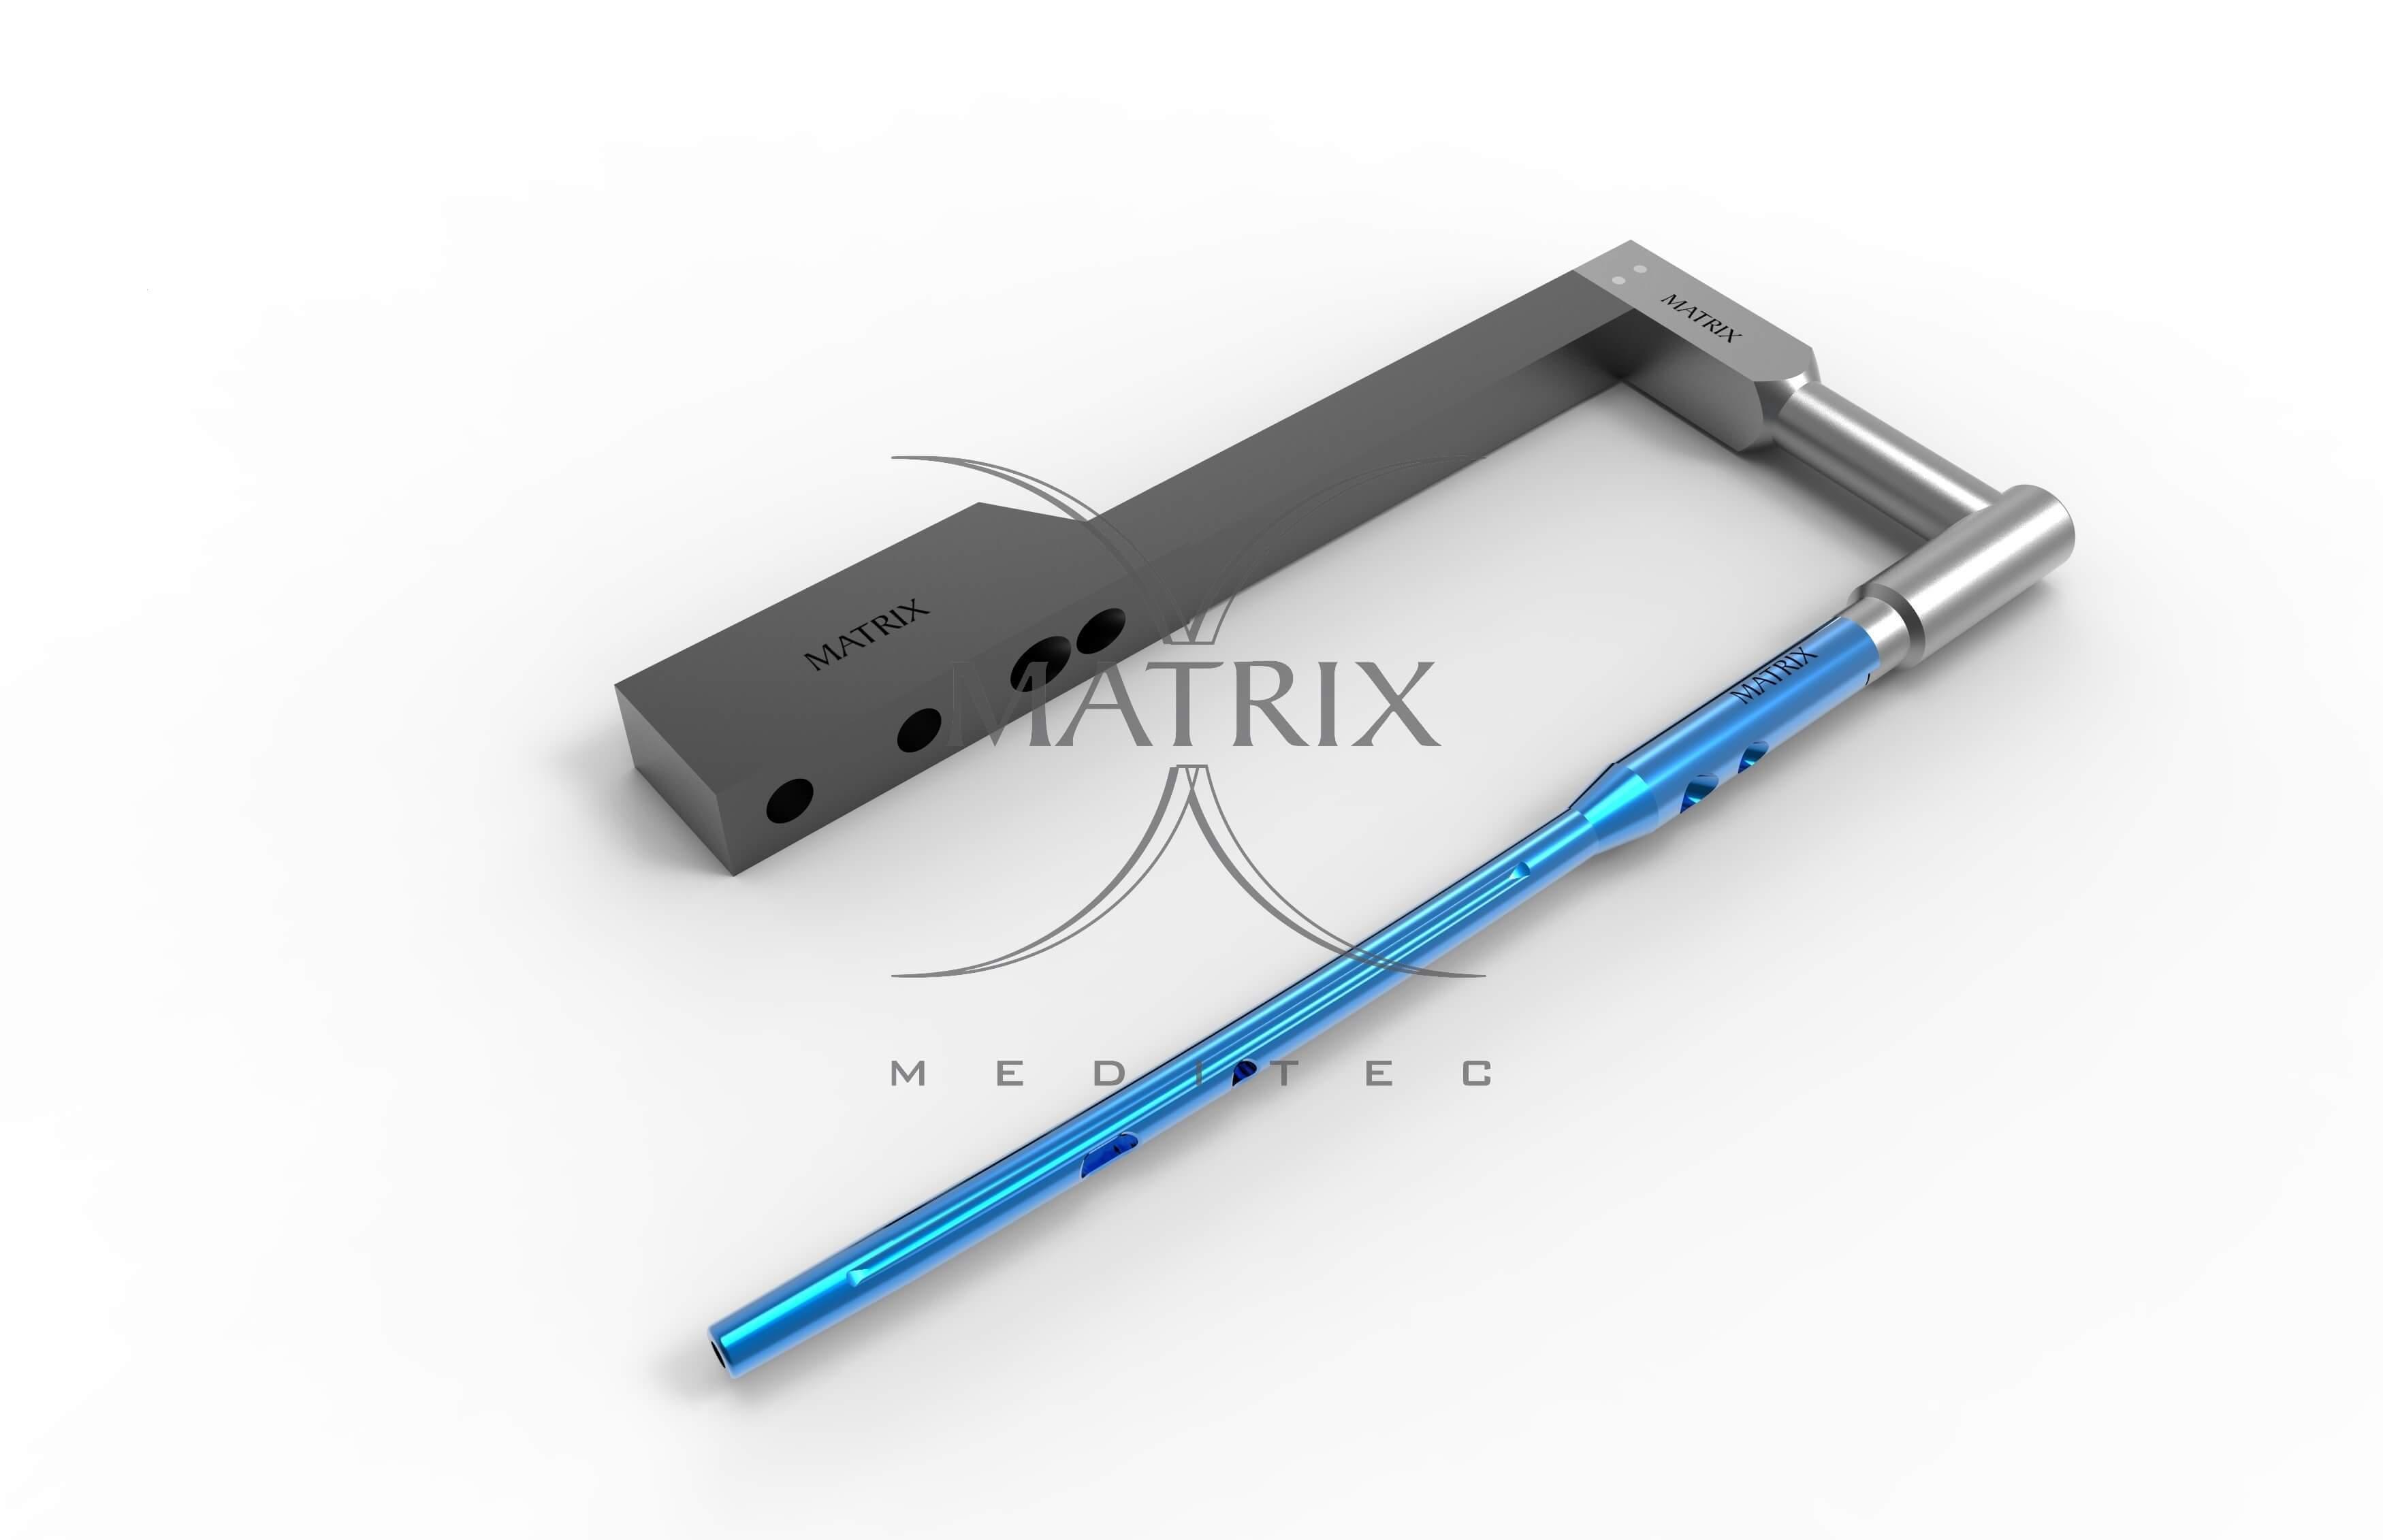 Matrix Meditec - manufacturer of orthopedic implants